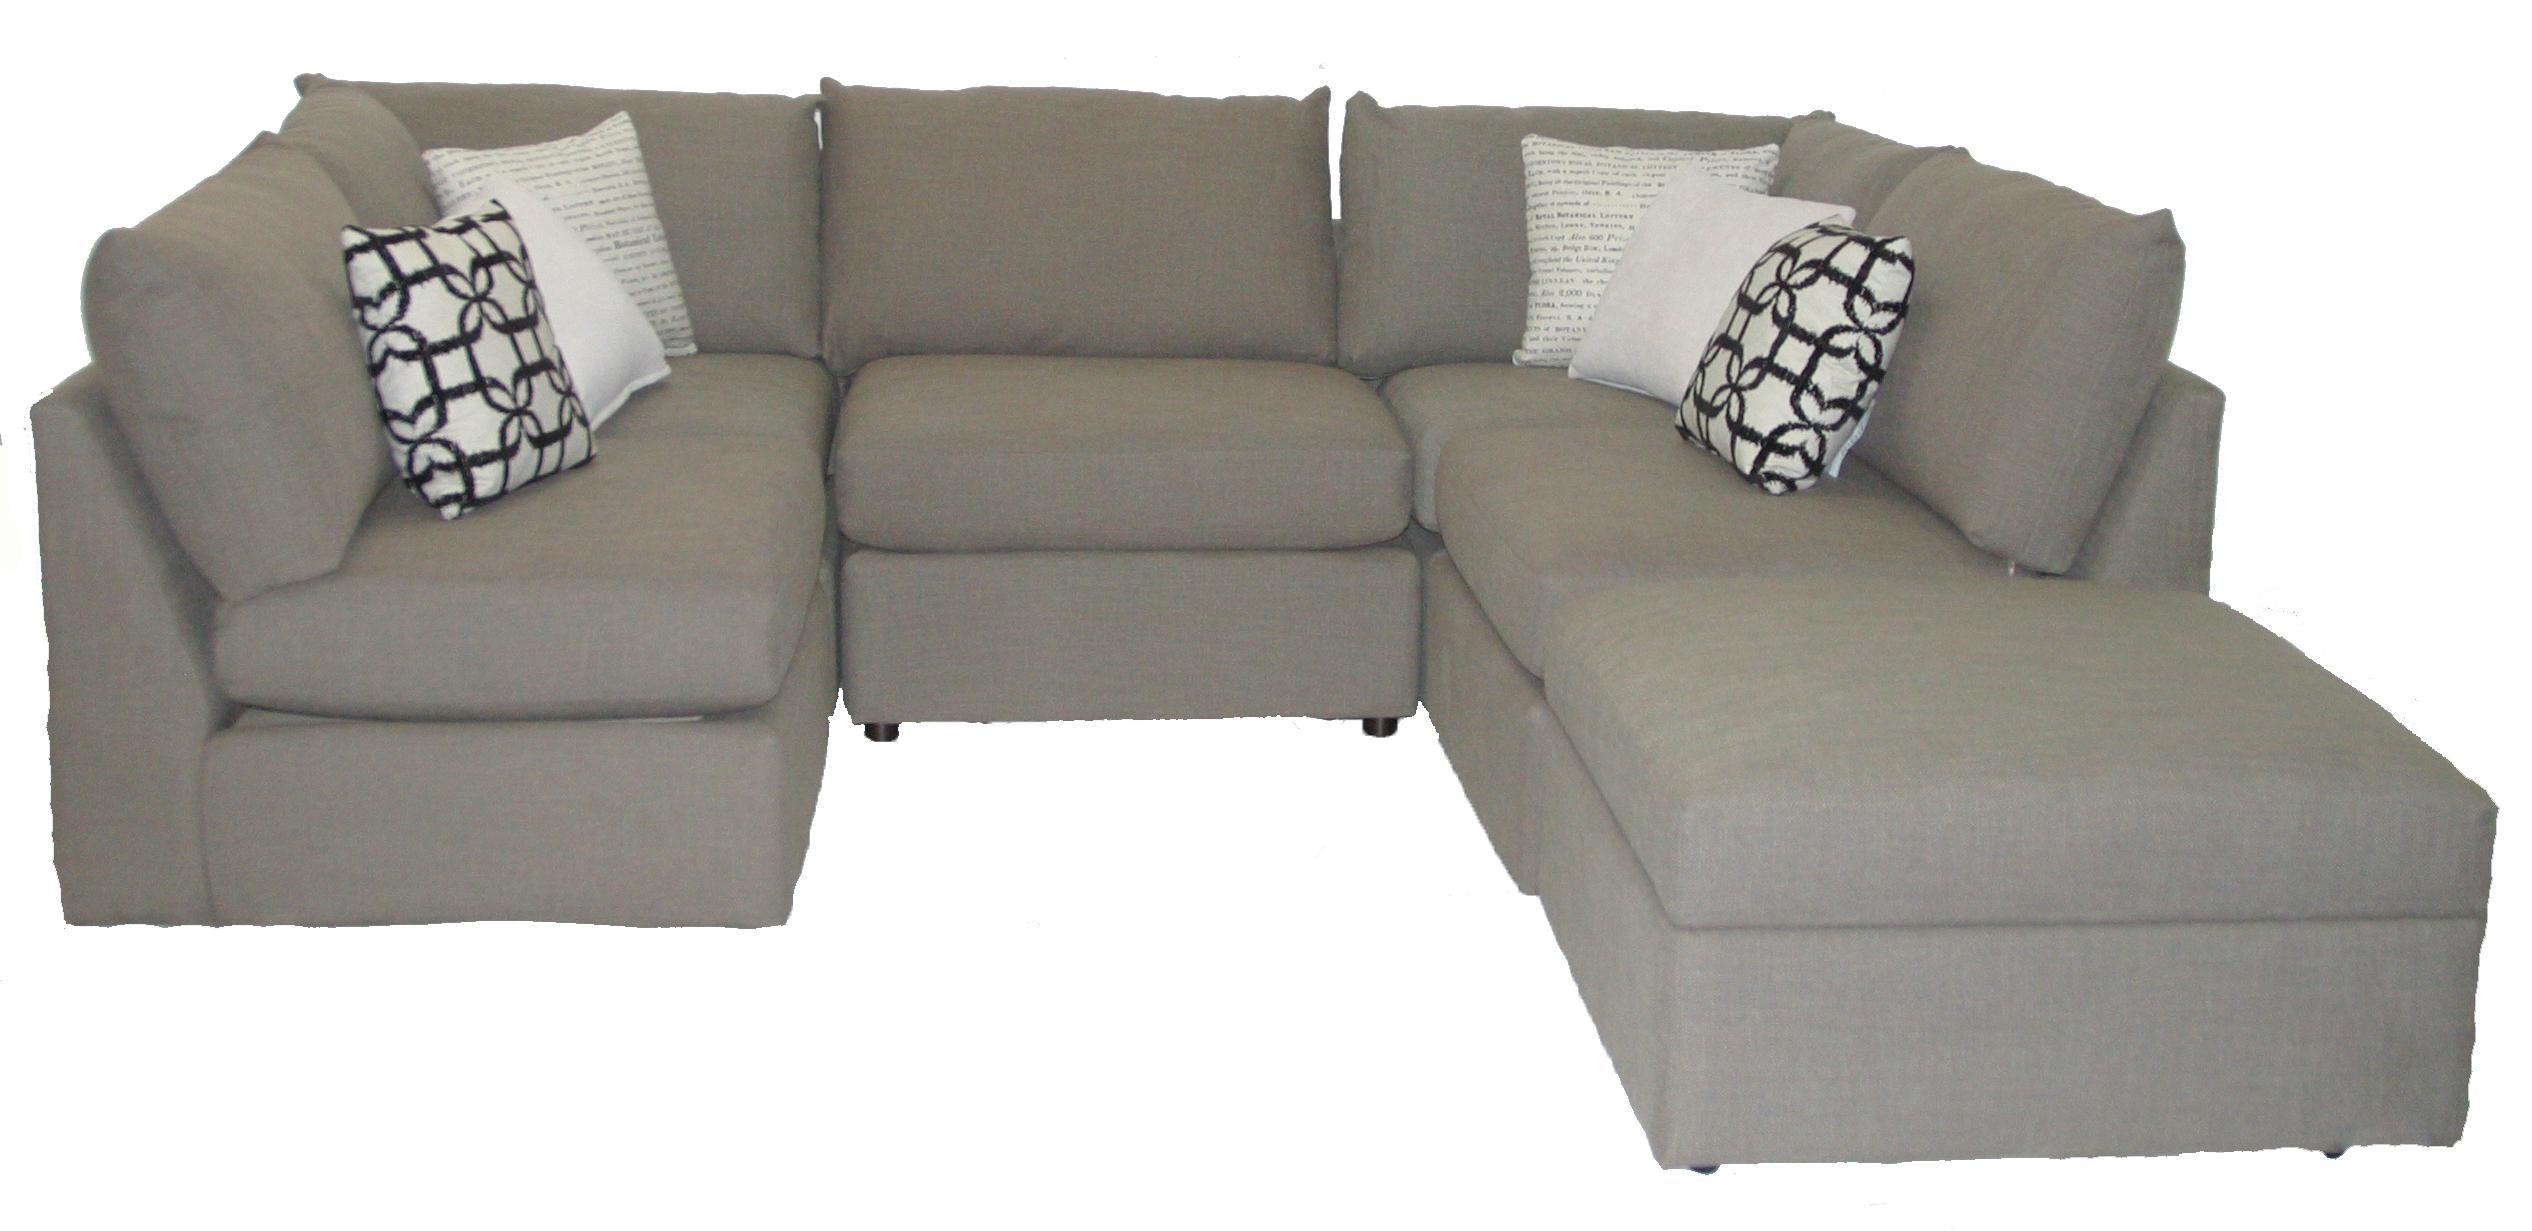 beckham ottoman living room bassett furniture year of clean water rh yearofcleanwater org